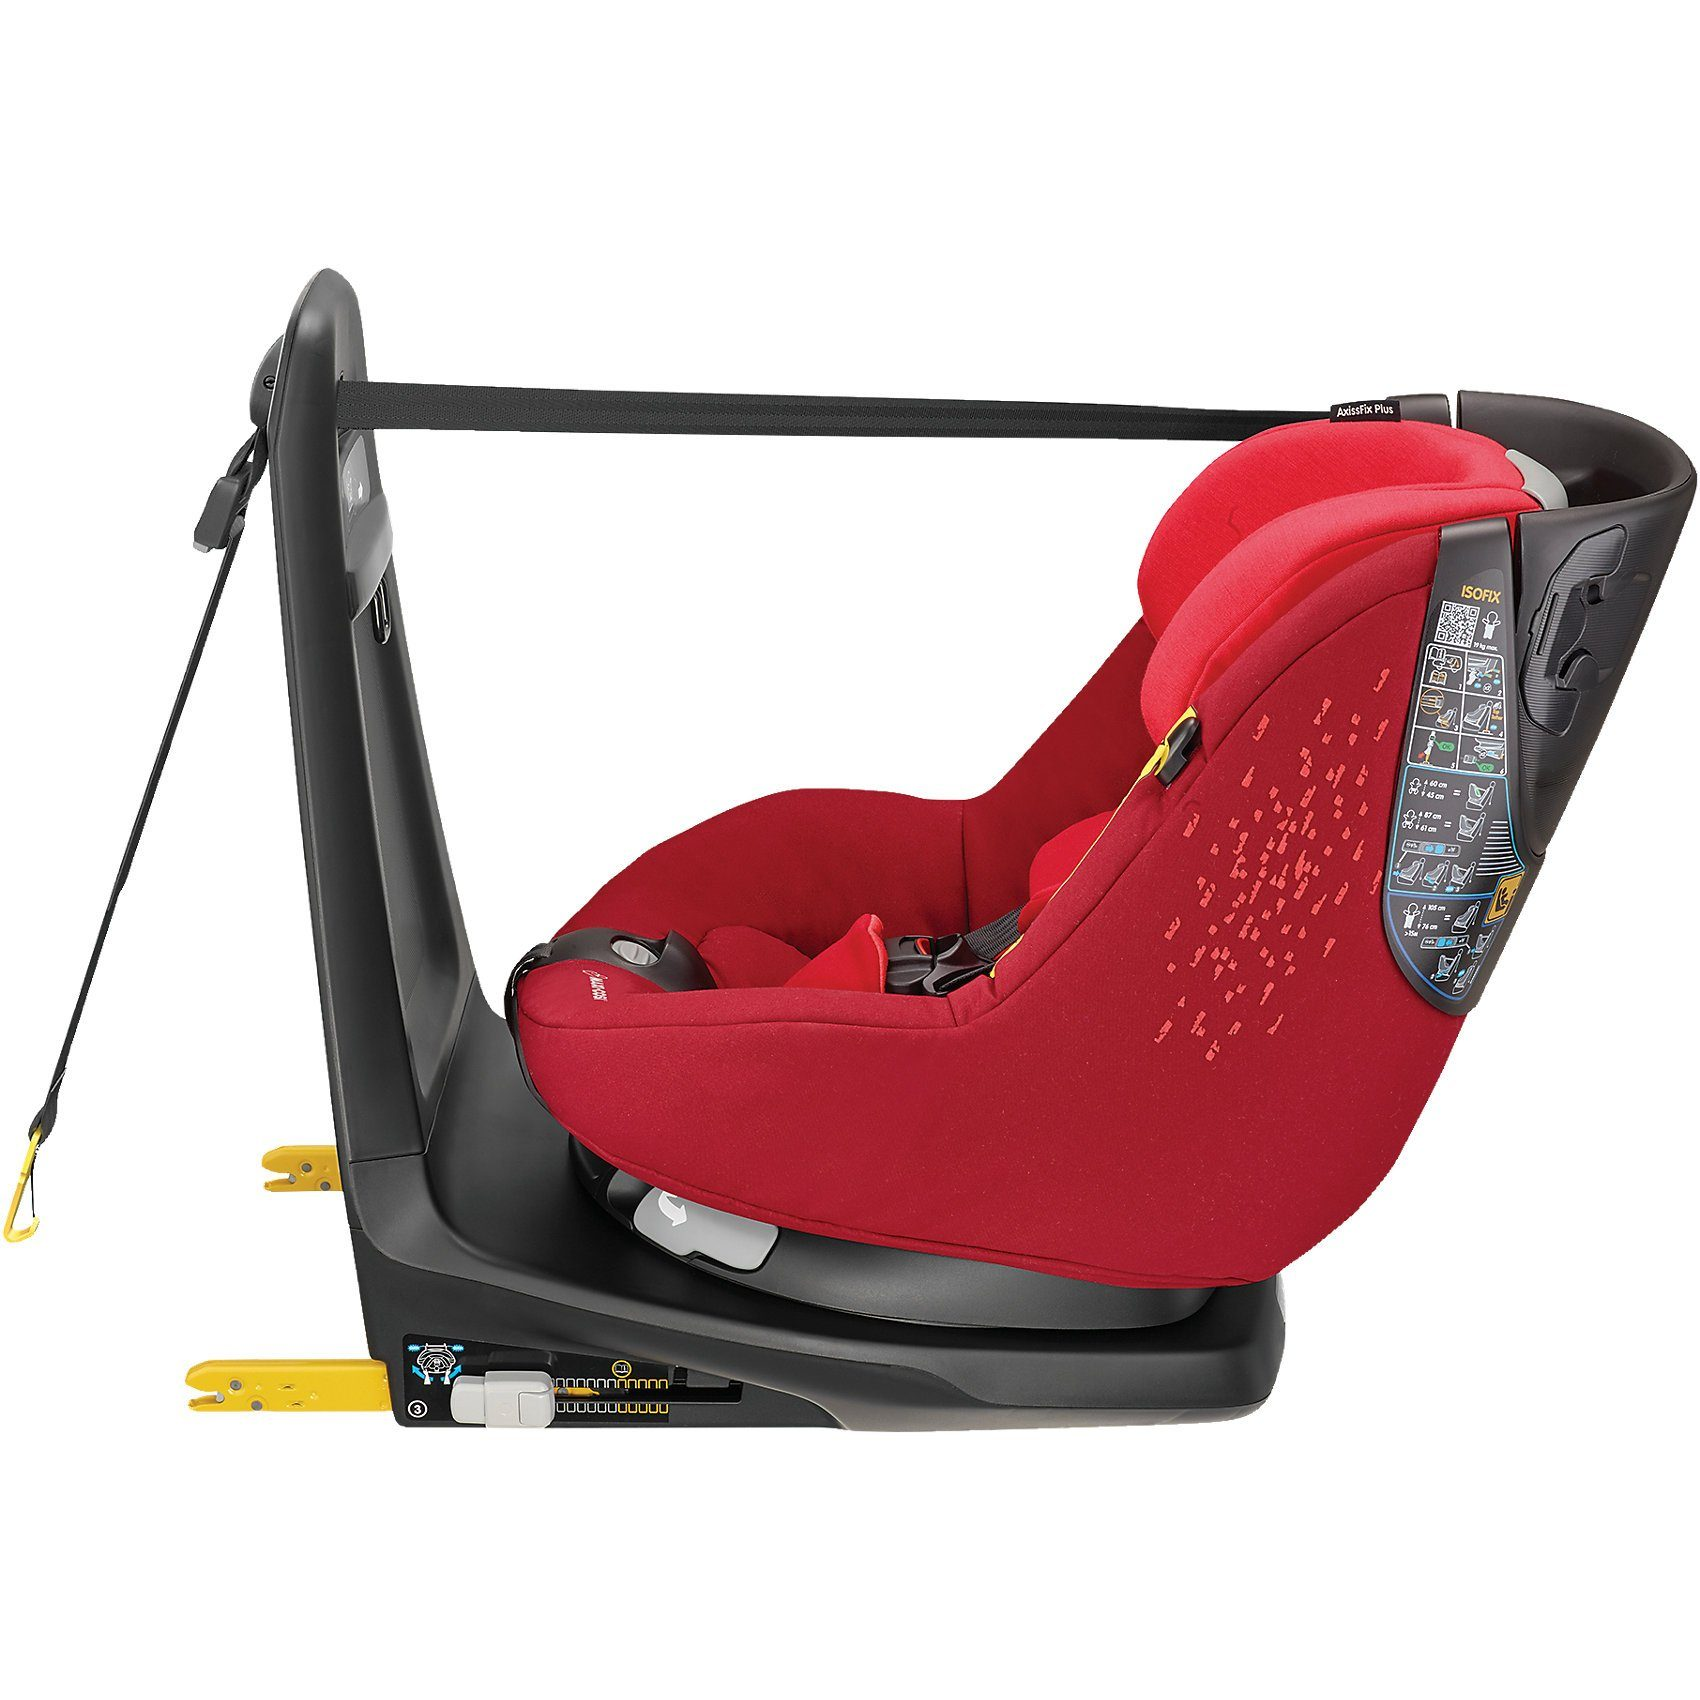 Maxi-Cosi Auto-Kindersitz AxissFix, Vivid Red, 2018